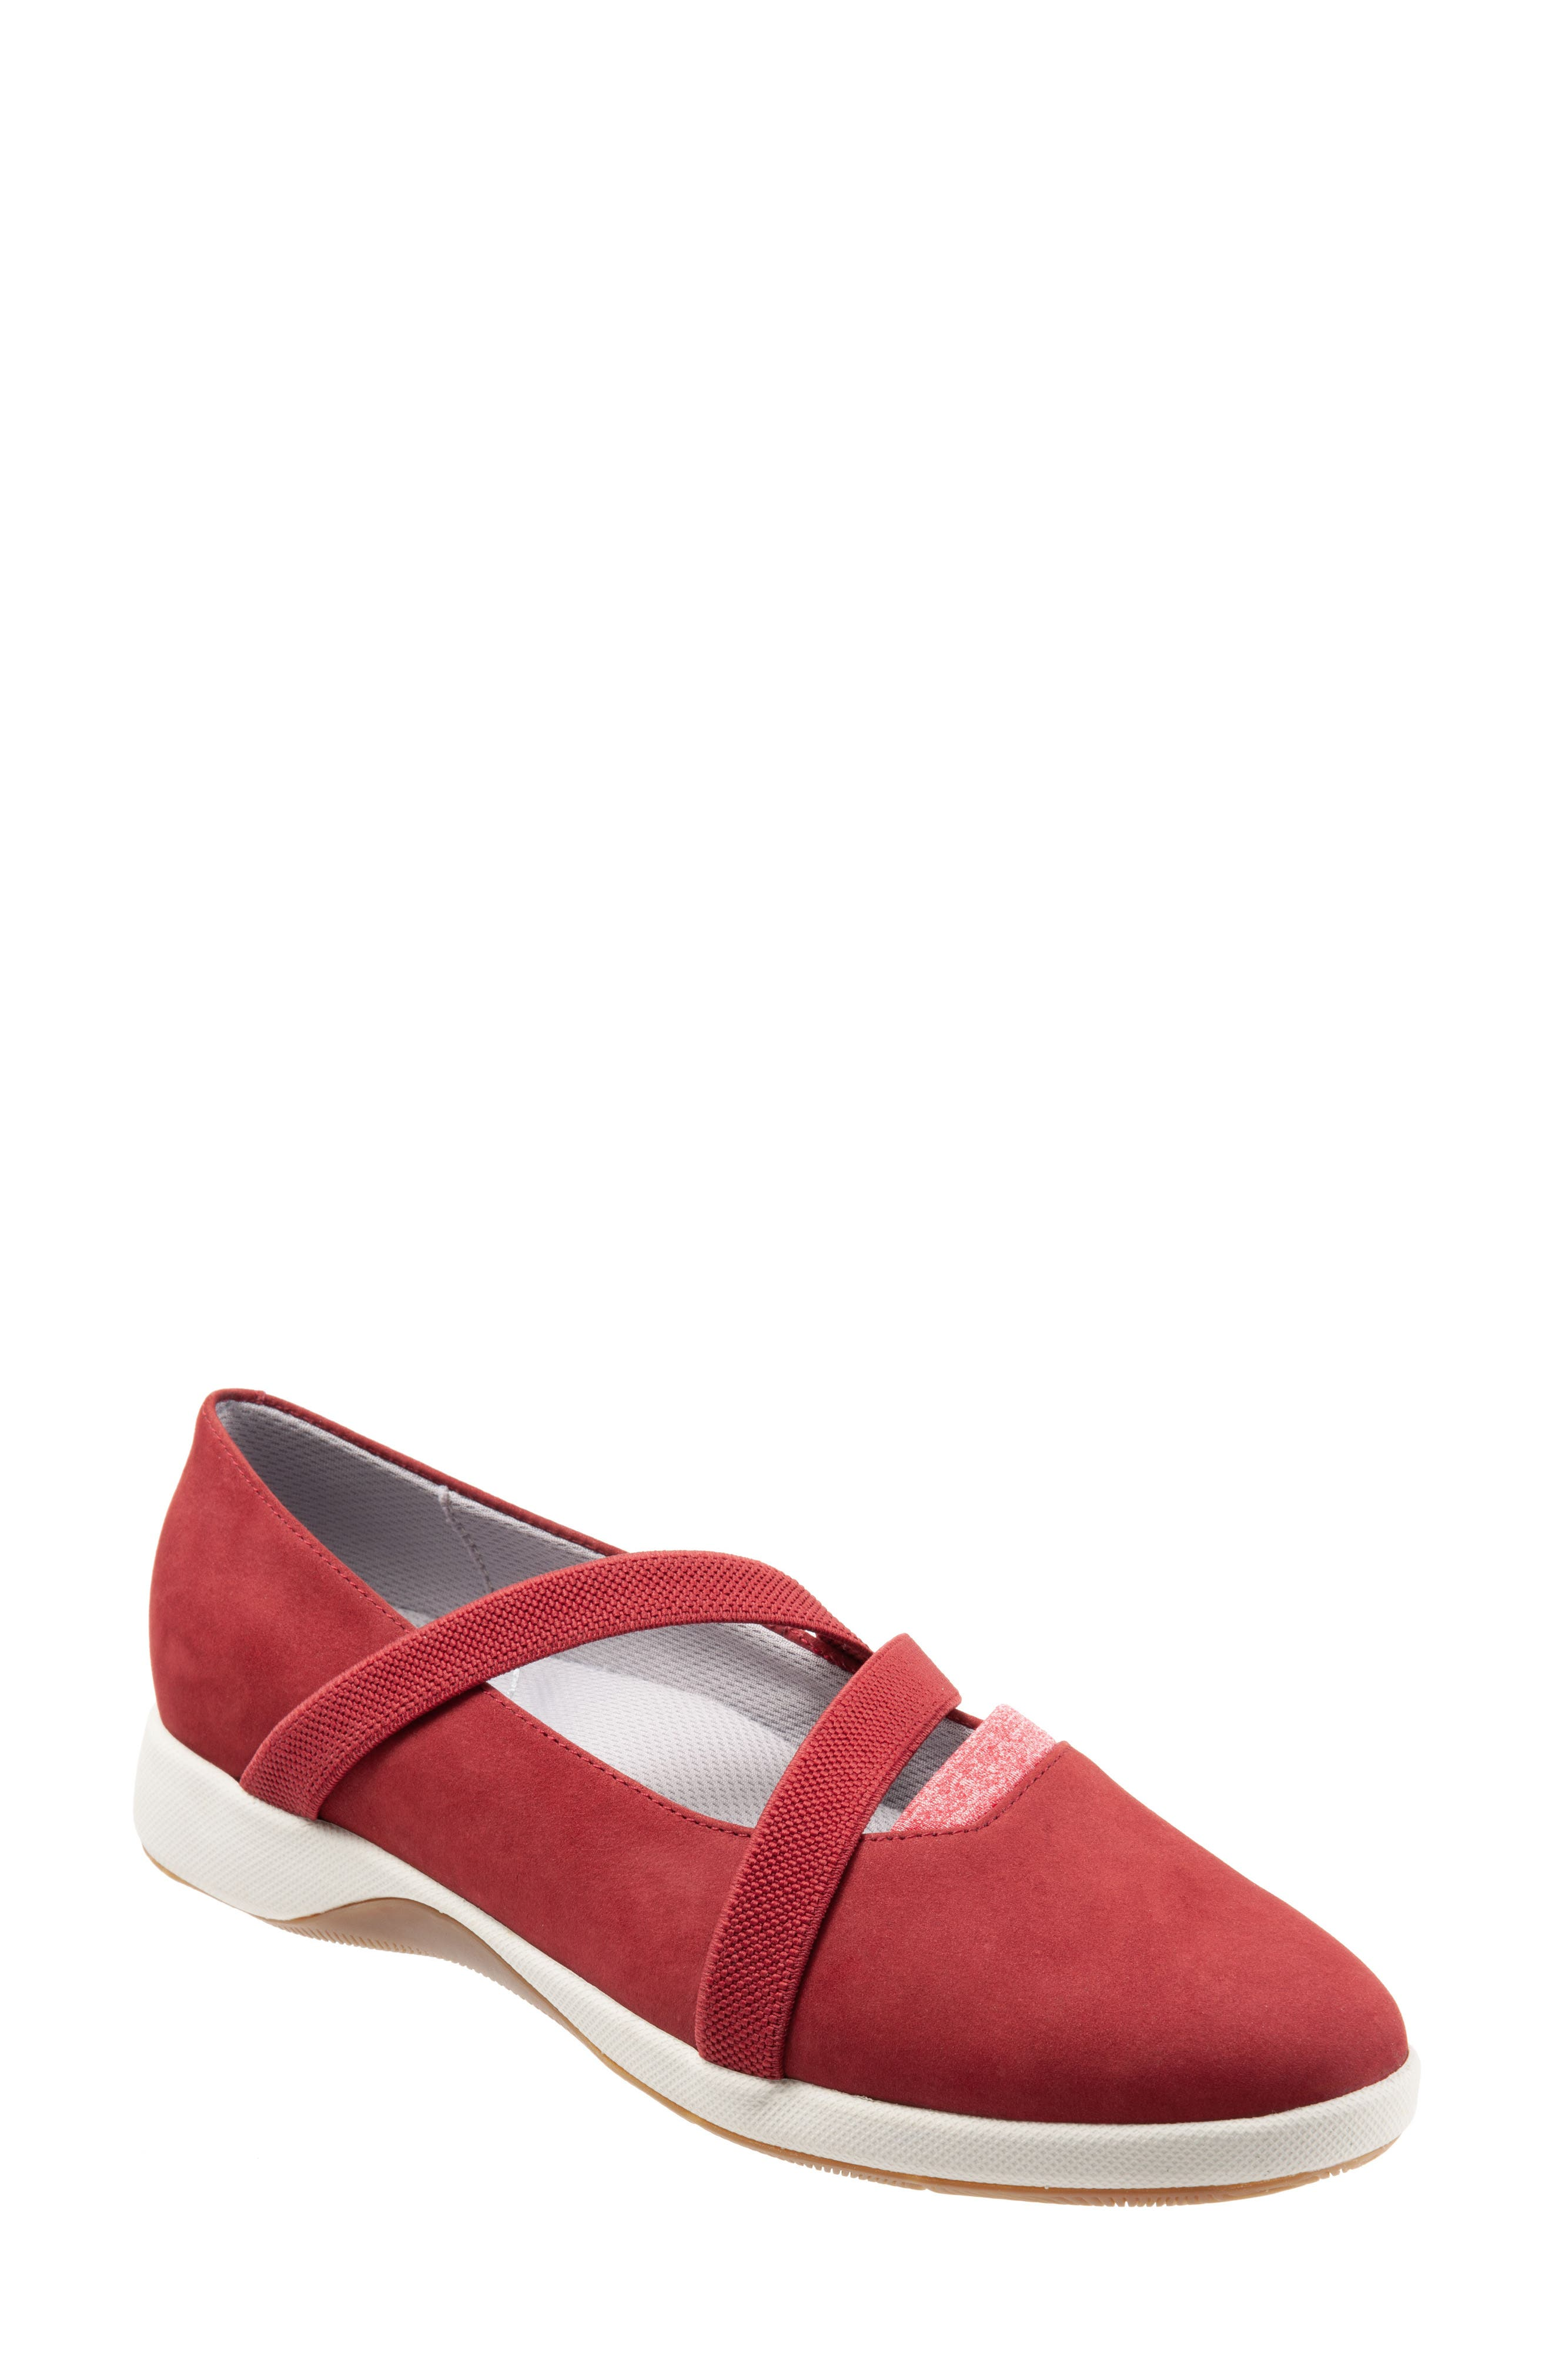 Softwalk Haely Mary Jane, Red